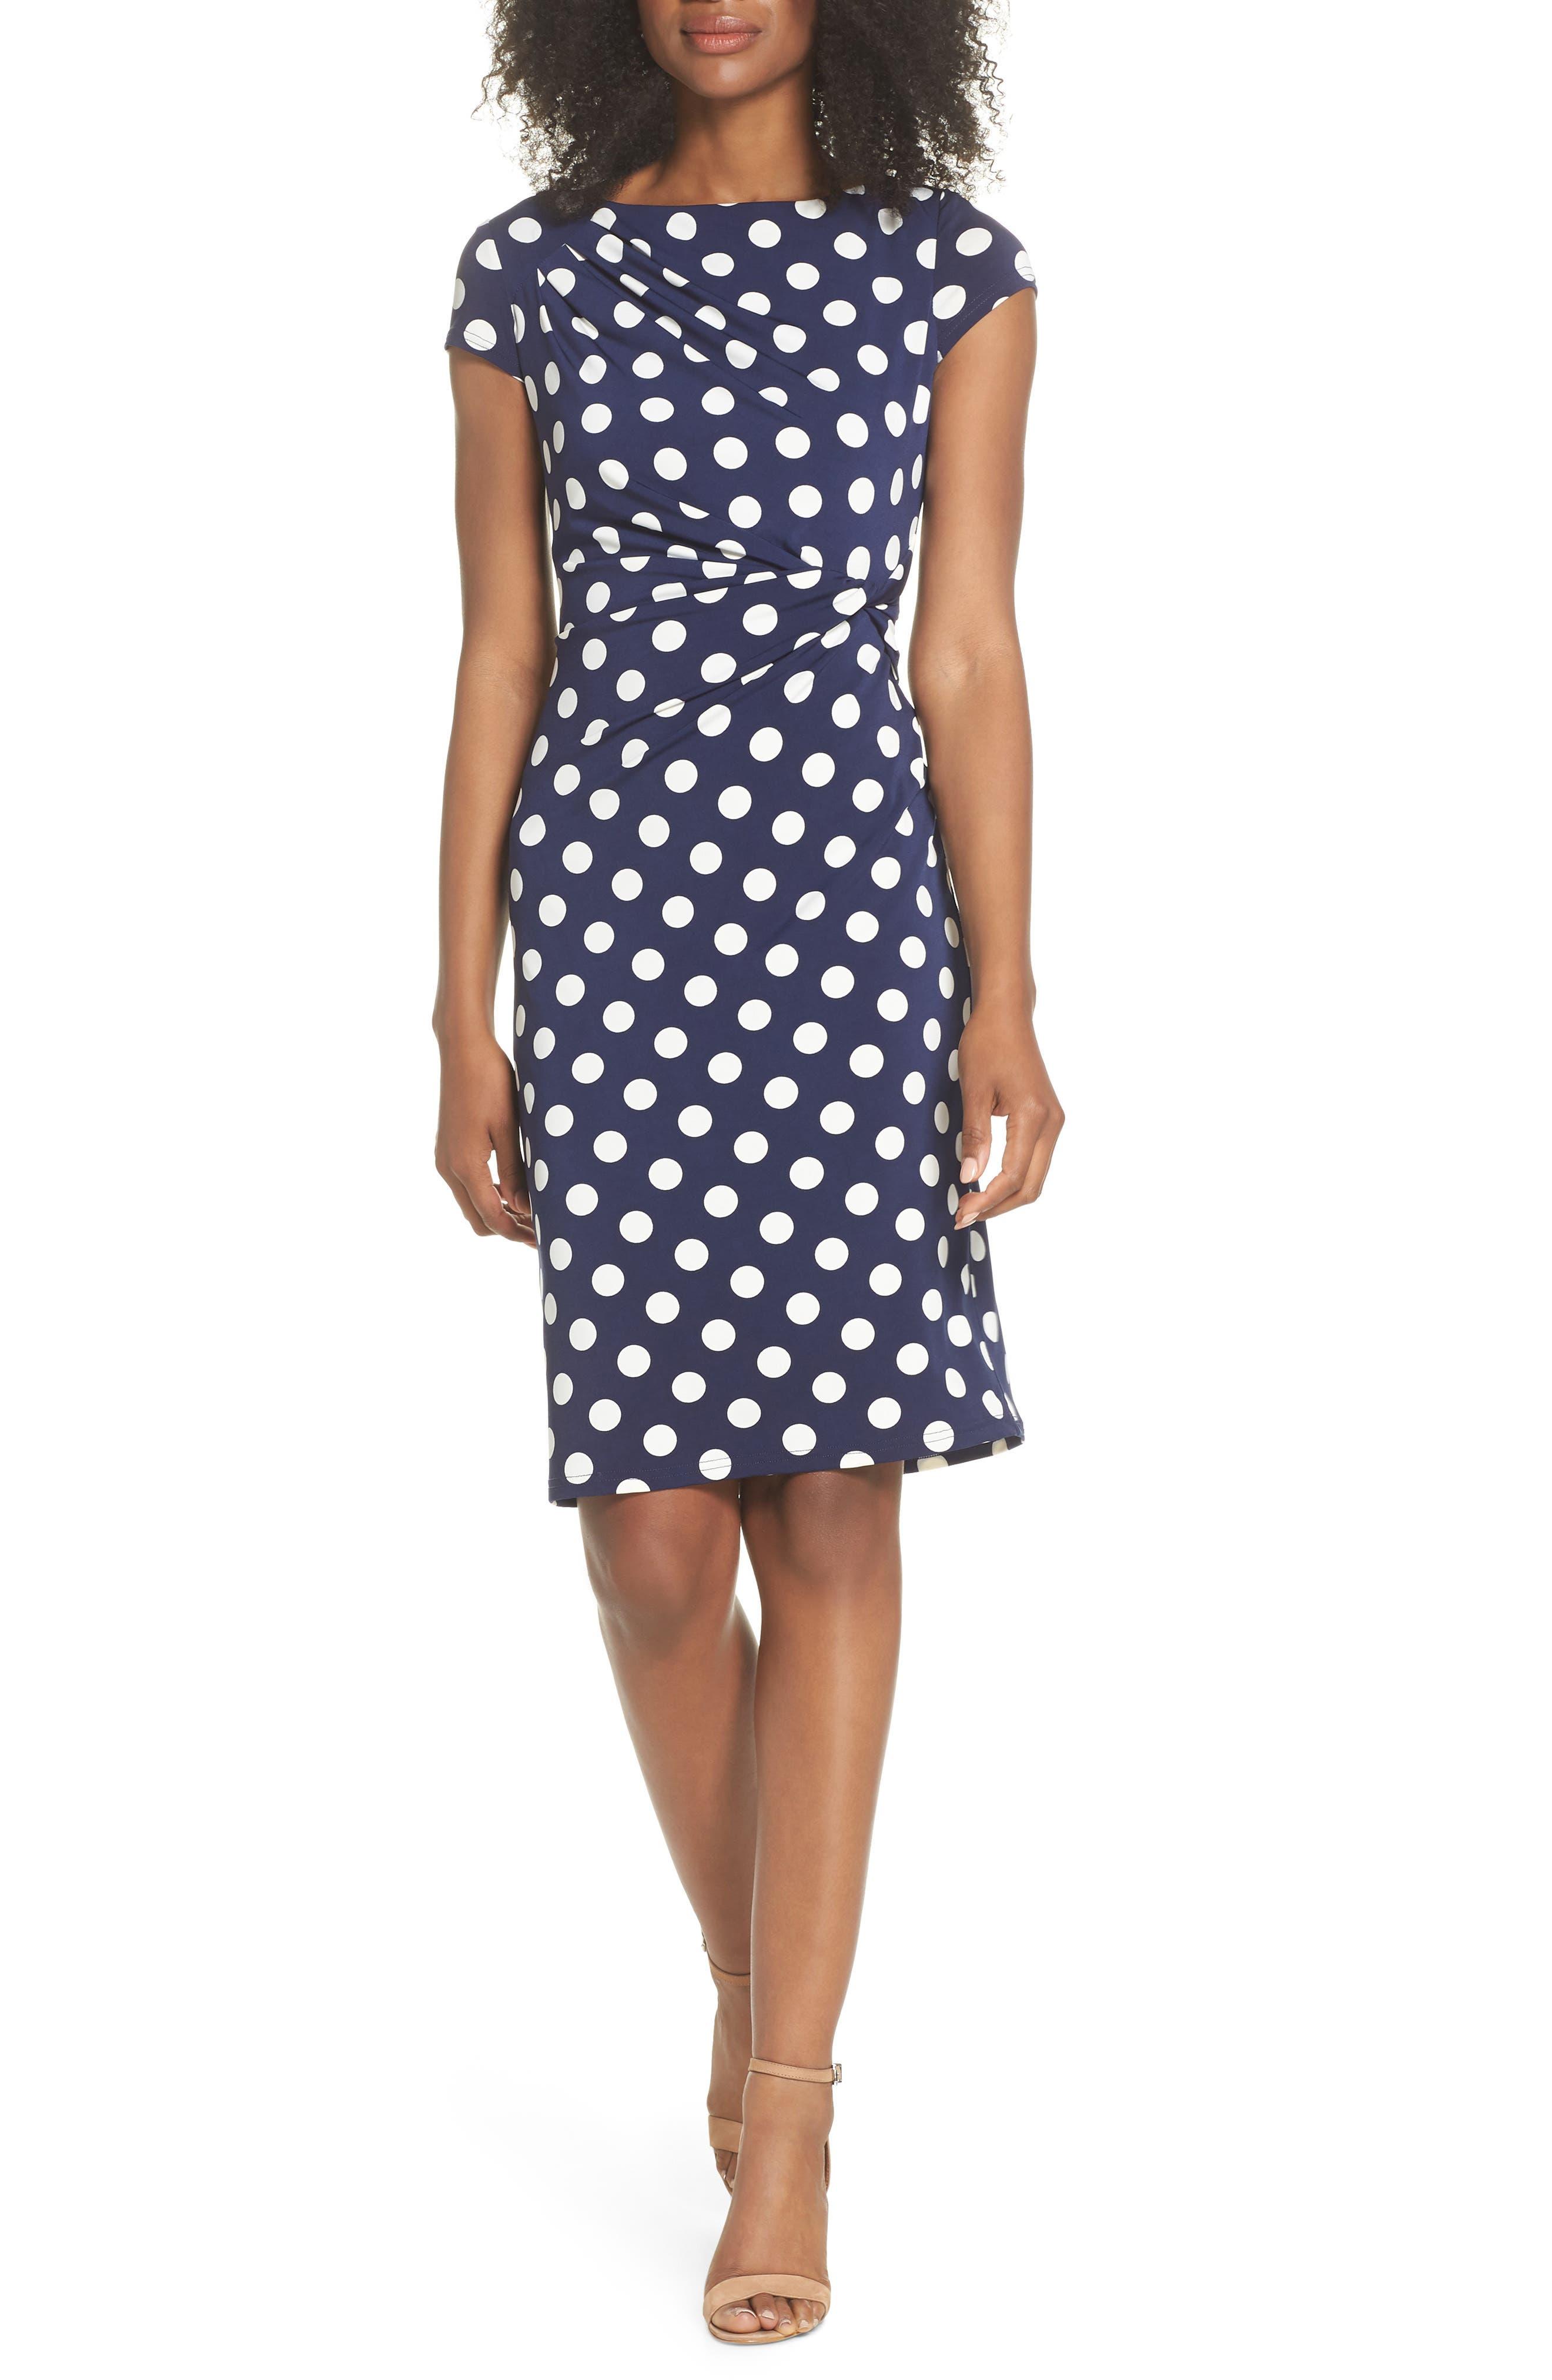 ELIZA J, Polka Dot Side Twist Sheath Dress, Main thumbnail 1, color, 407